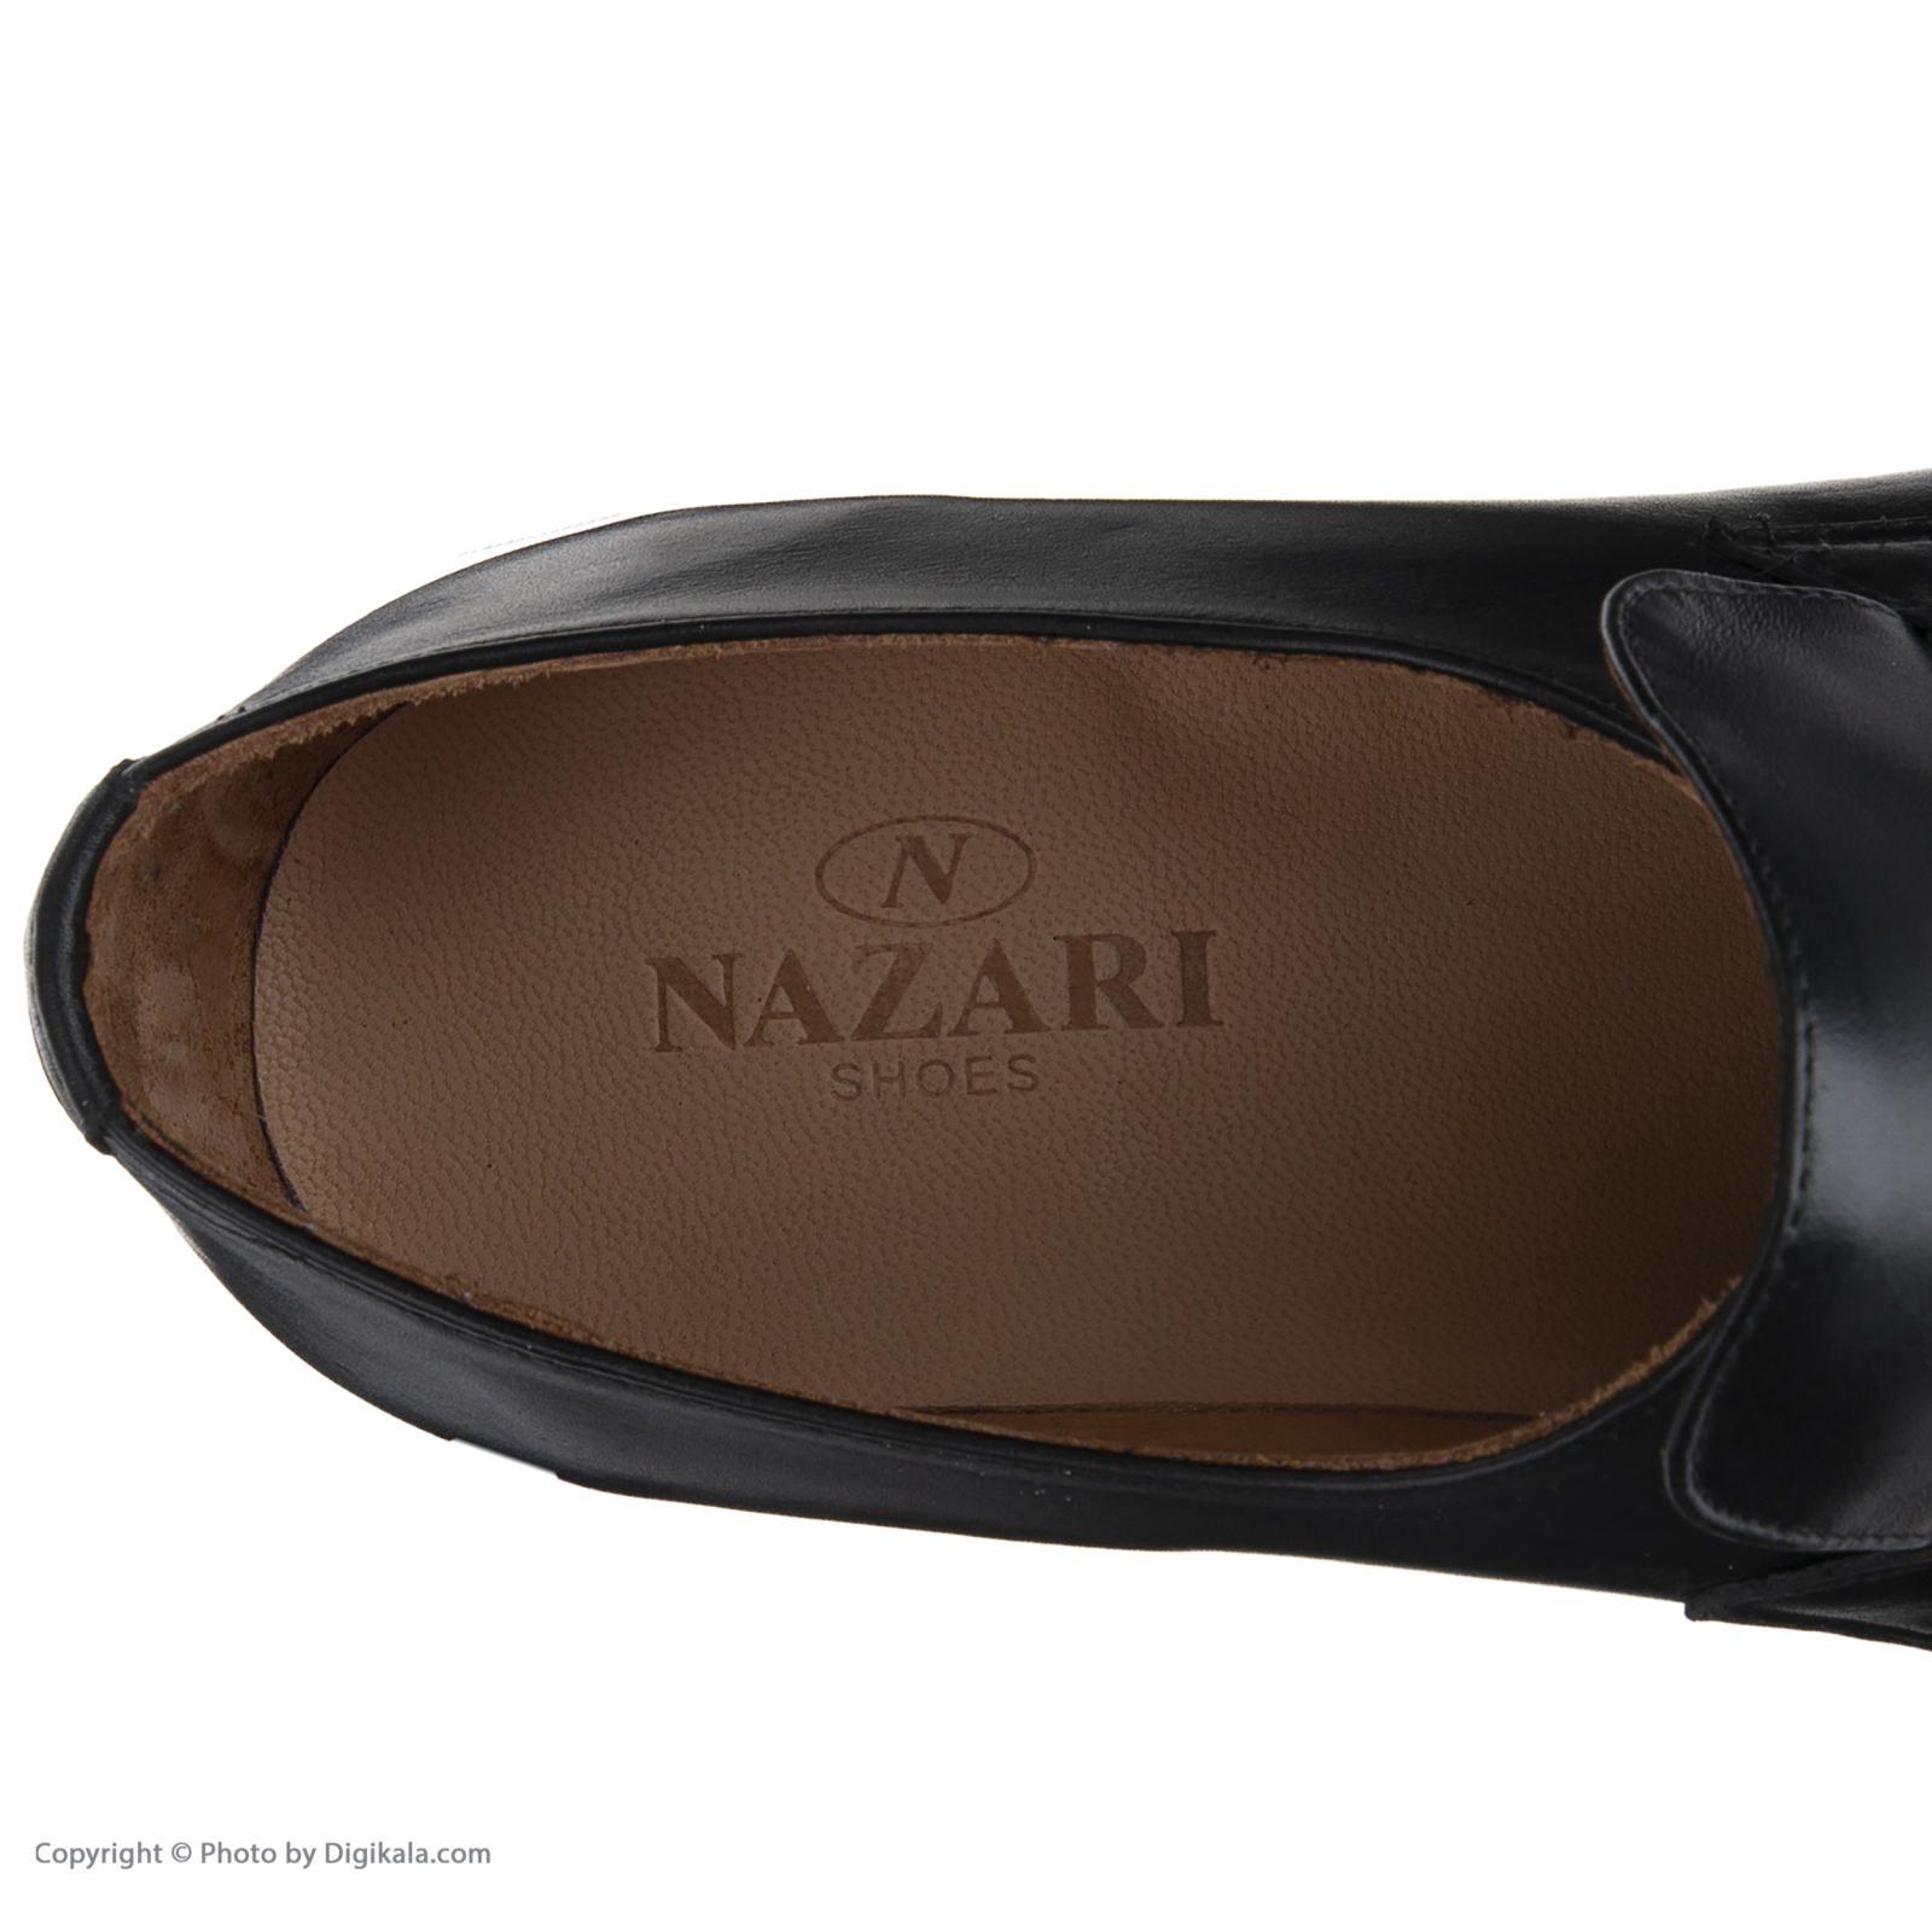 کفش مردانه نظری کد 416 -  - 7